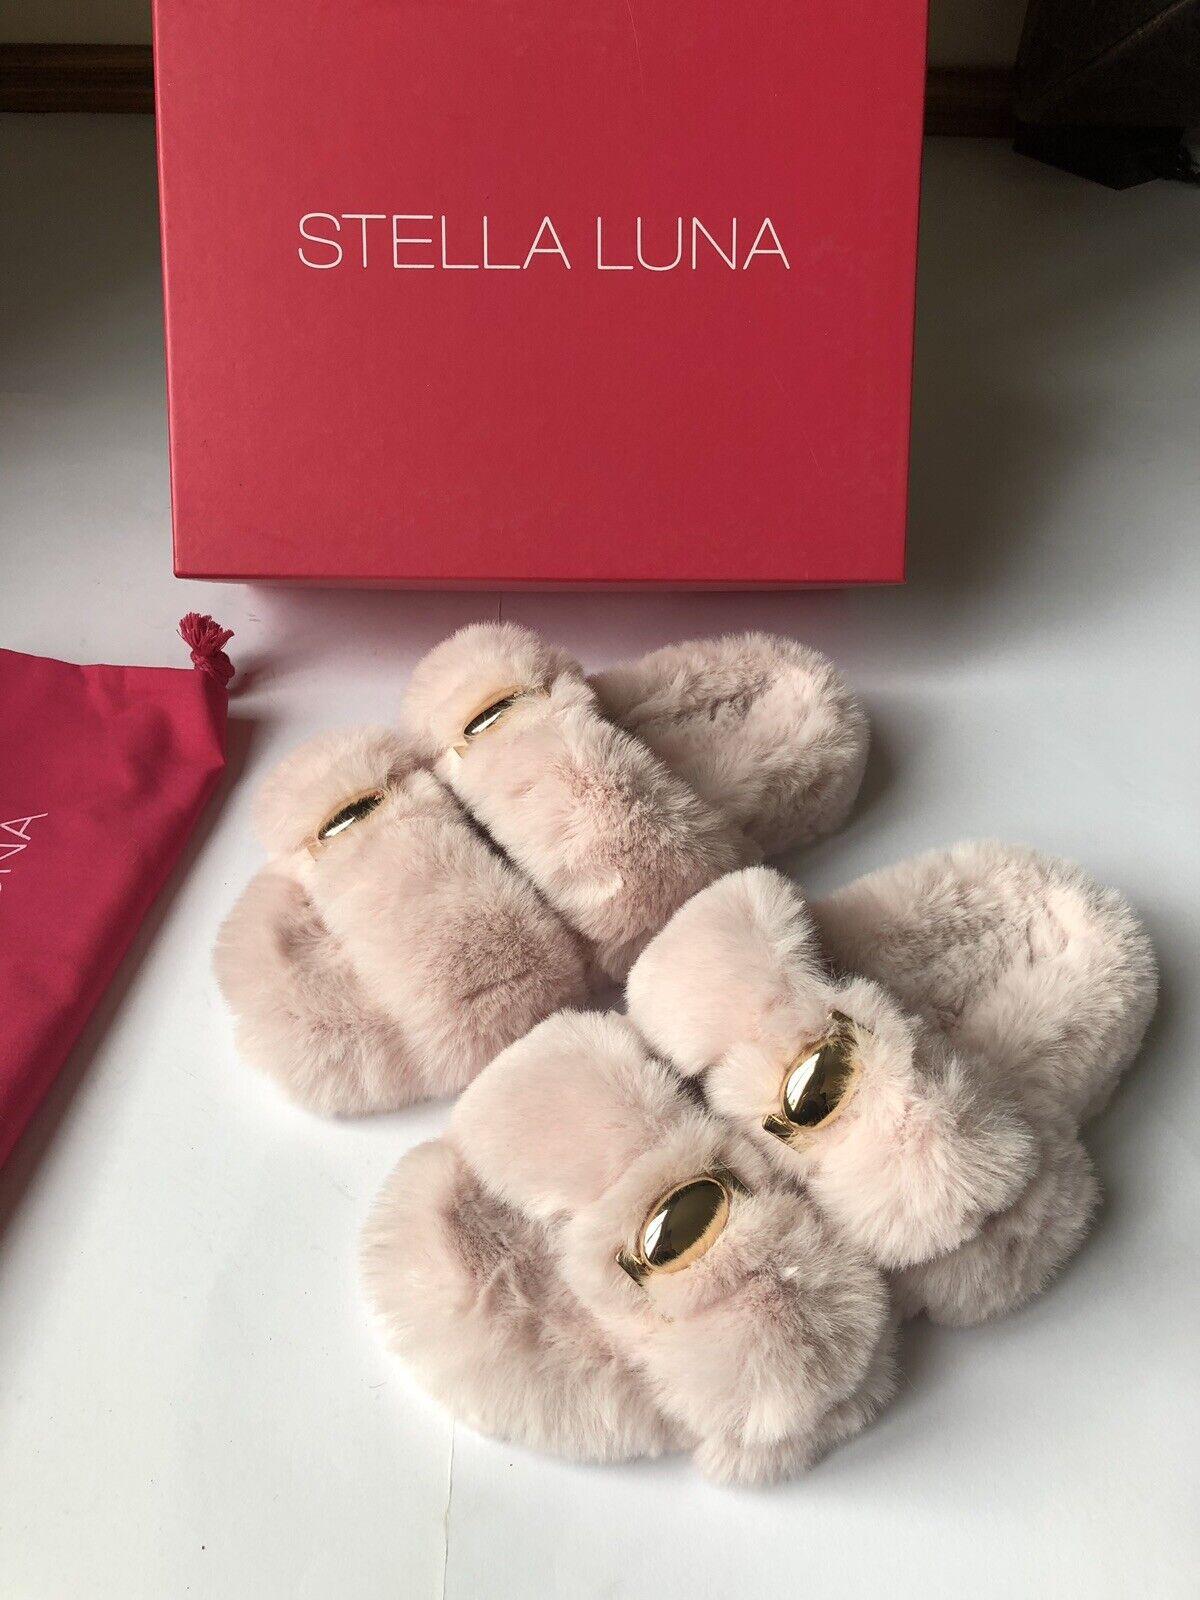 Stella Luna DESIGN SANDALS SHOES pink SIZE 37,5 NEW OVP L.P.245 Euro